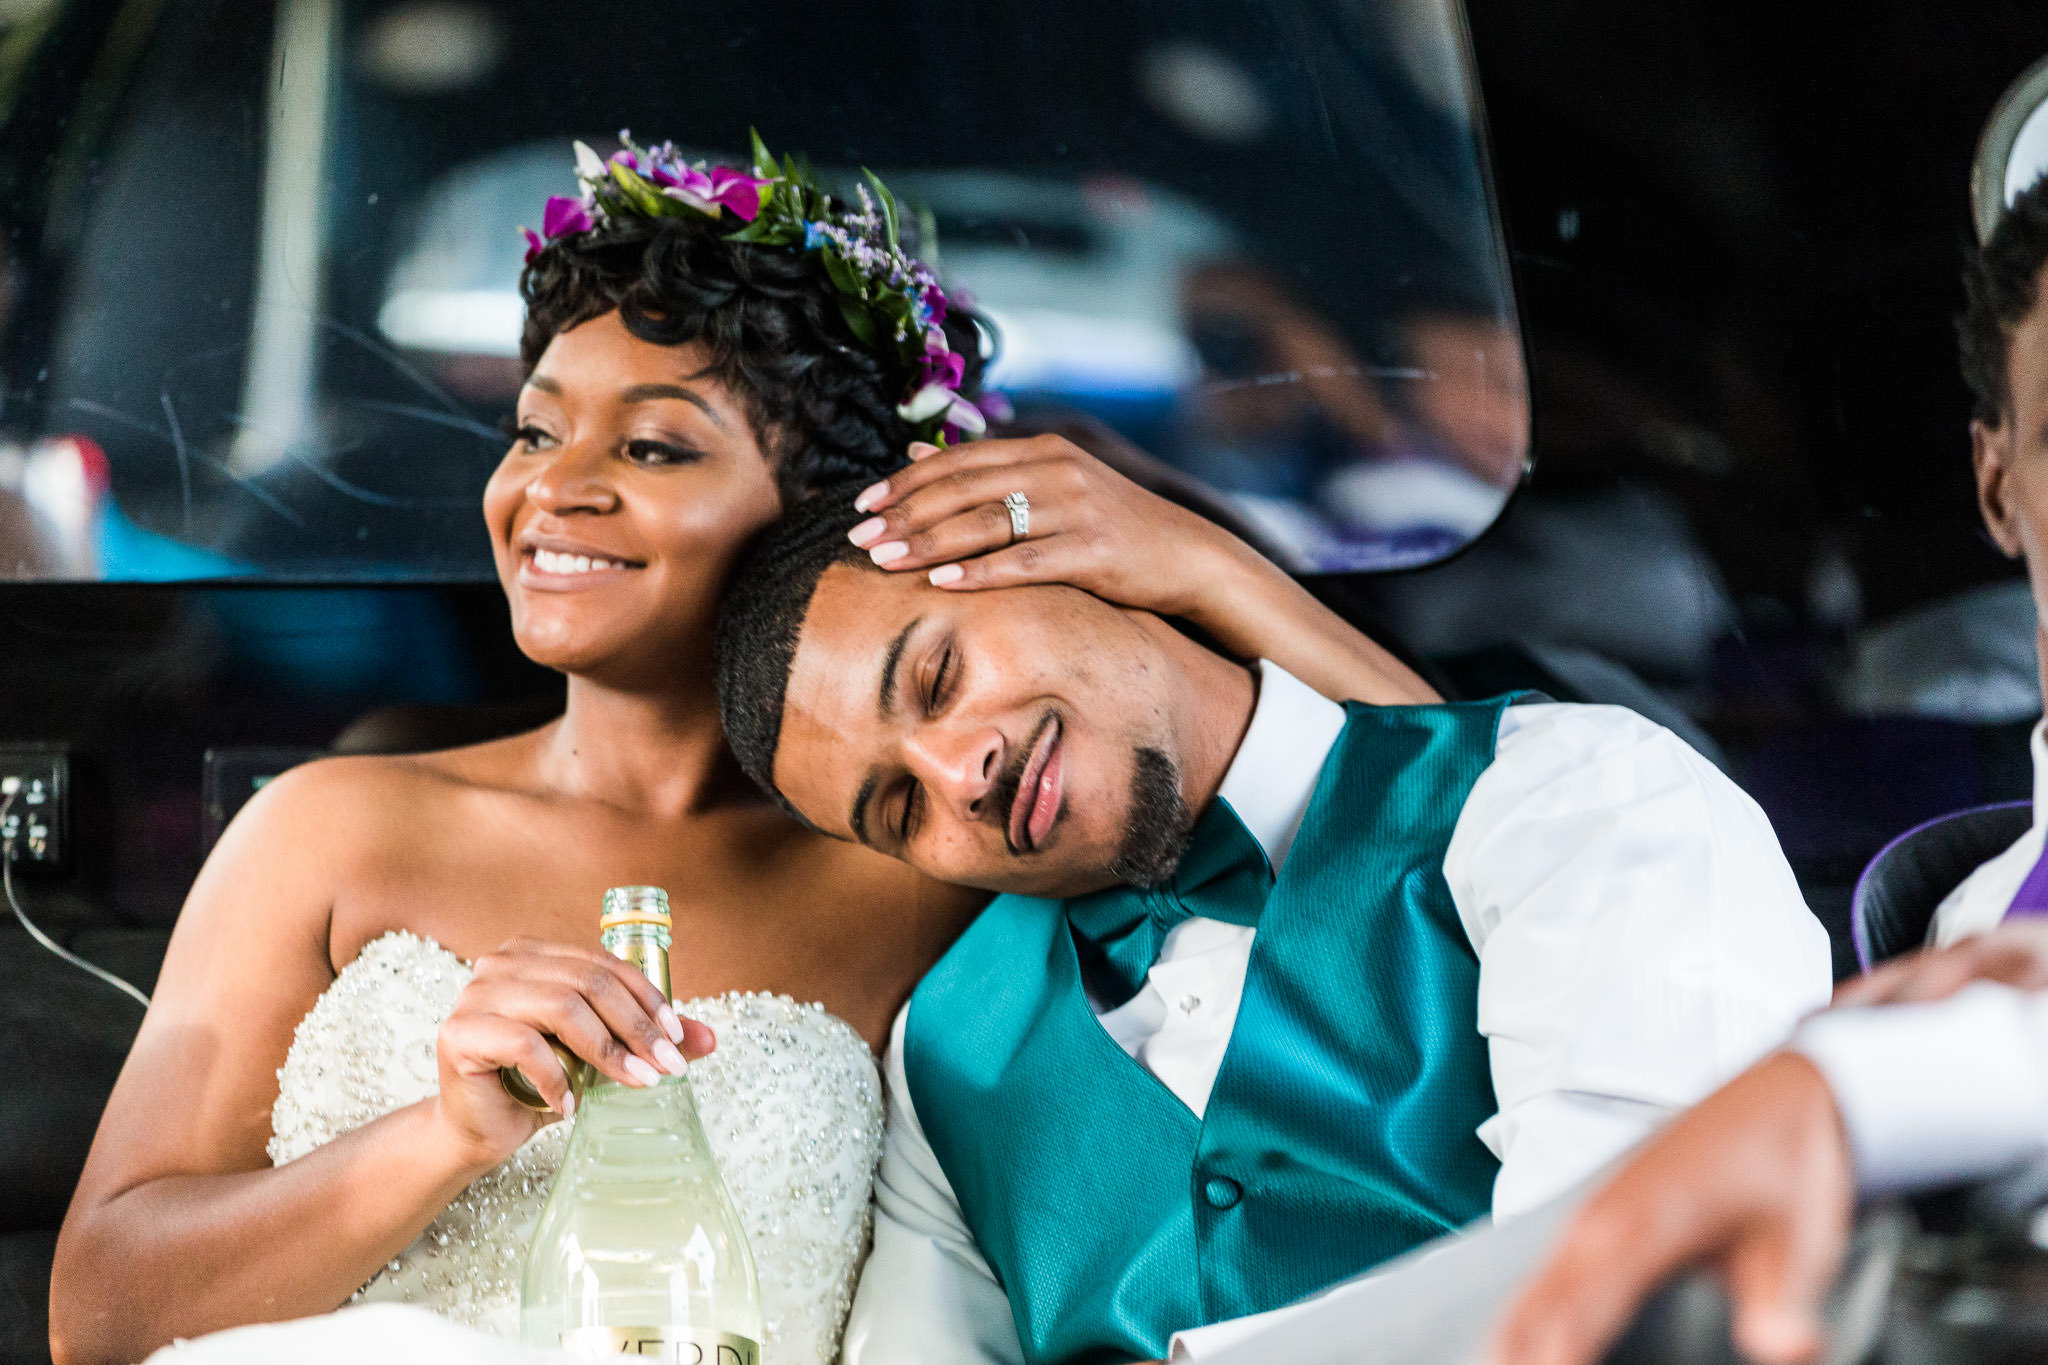 st-louis-photographer-machinist-hall-wedding-23.jpg